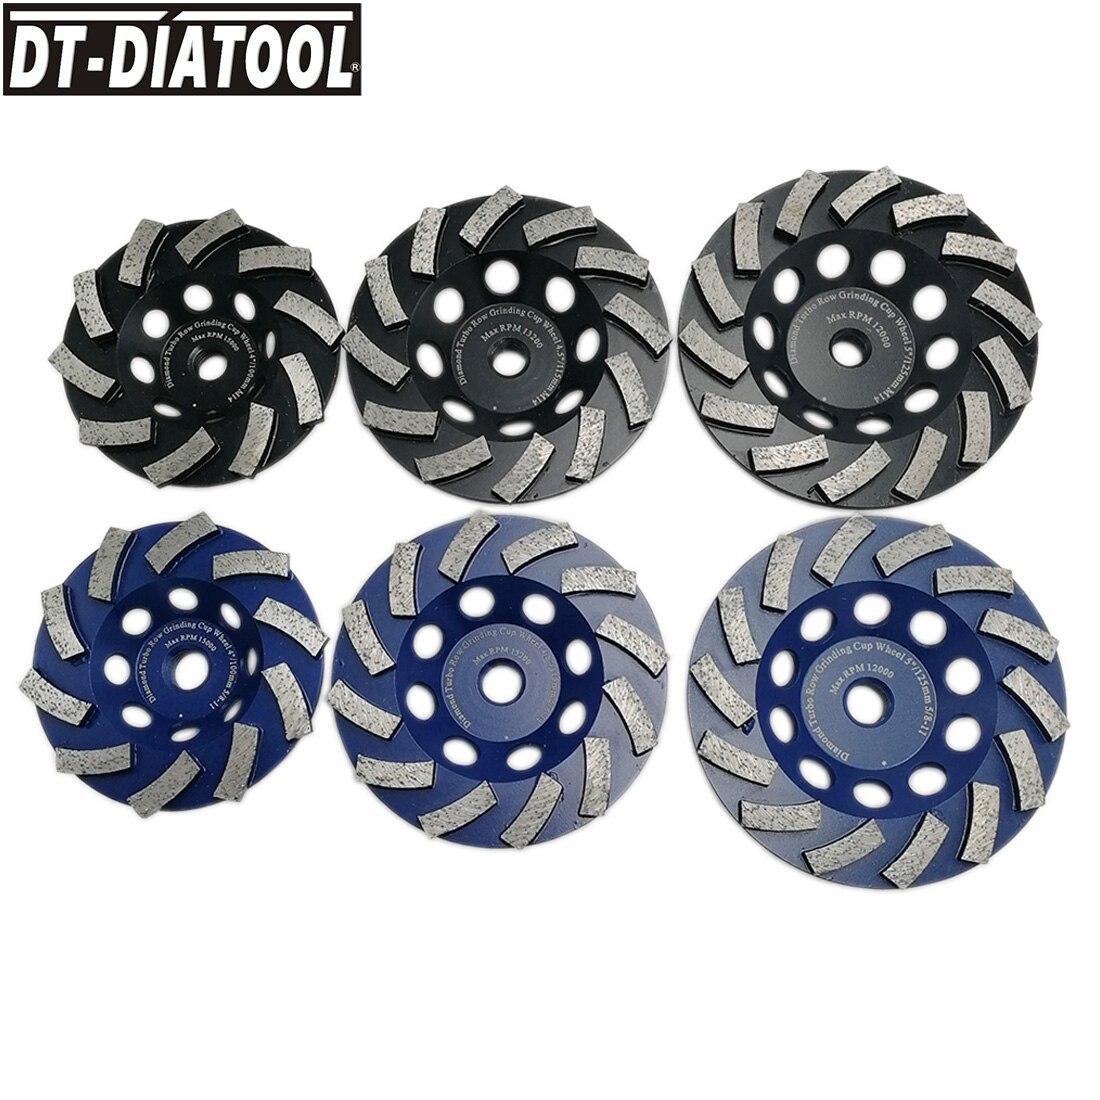 "DT-DIATOOL 2pcs/pk Dia4""/4.5""/5""/7"" Diamond Segmented Turbo Cup Grinding Wheel M14 or 5/8-11 Thread For Granite Marble Concrete"